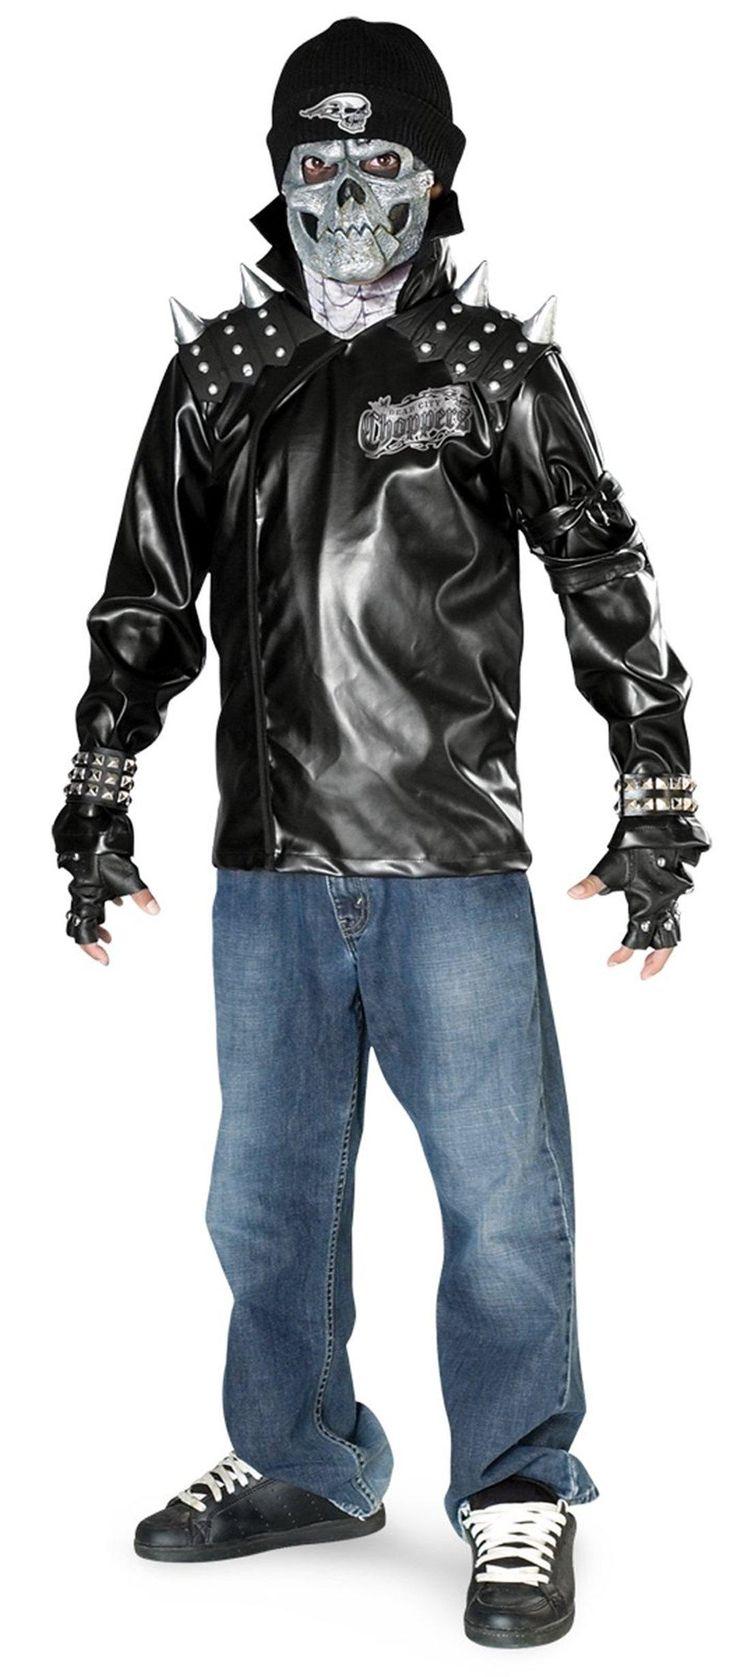 Metal Skull Biker Teen Costume from Buycostumes.com